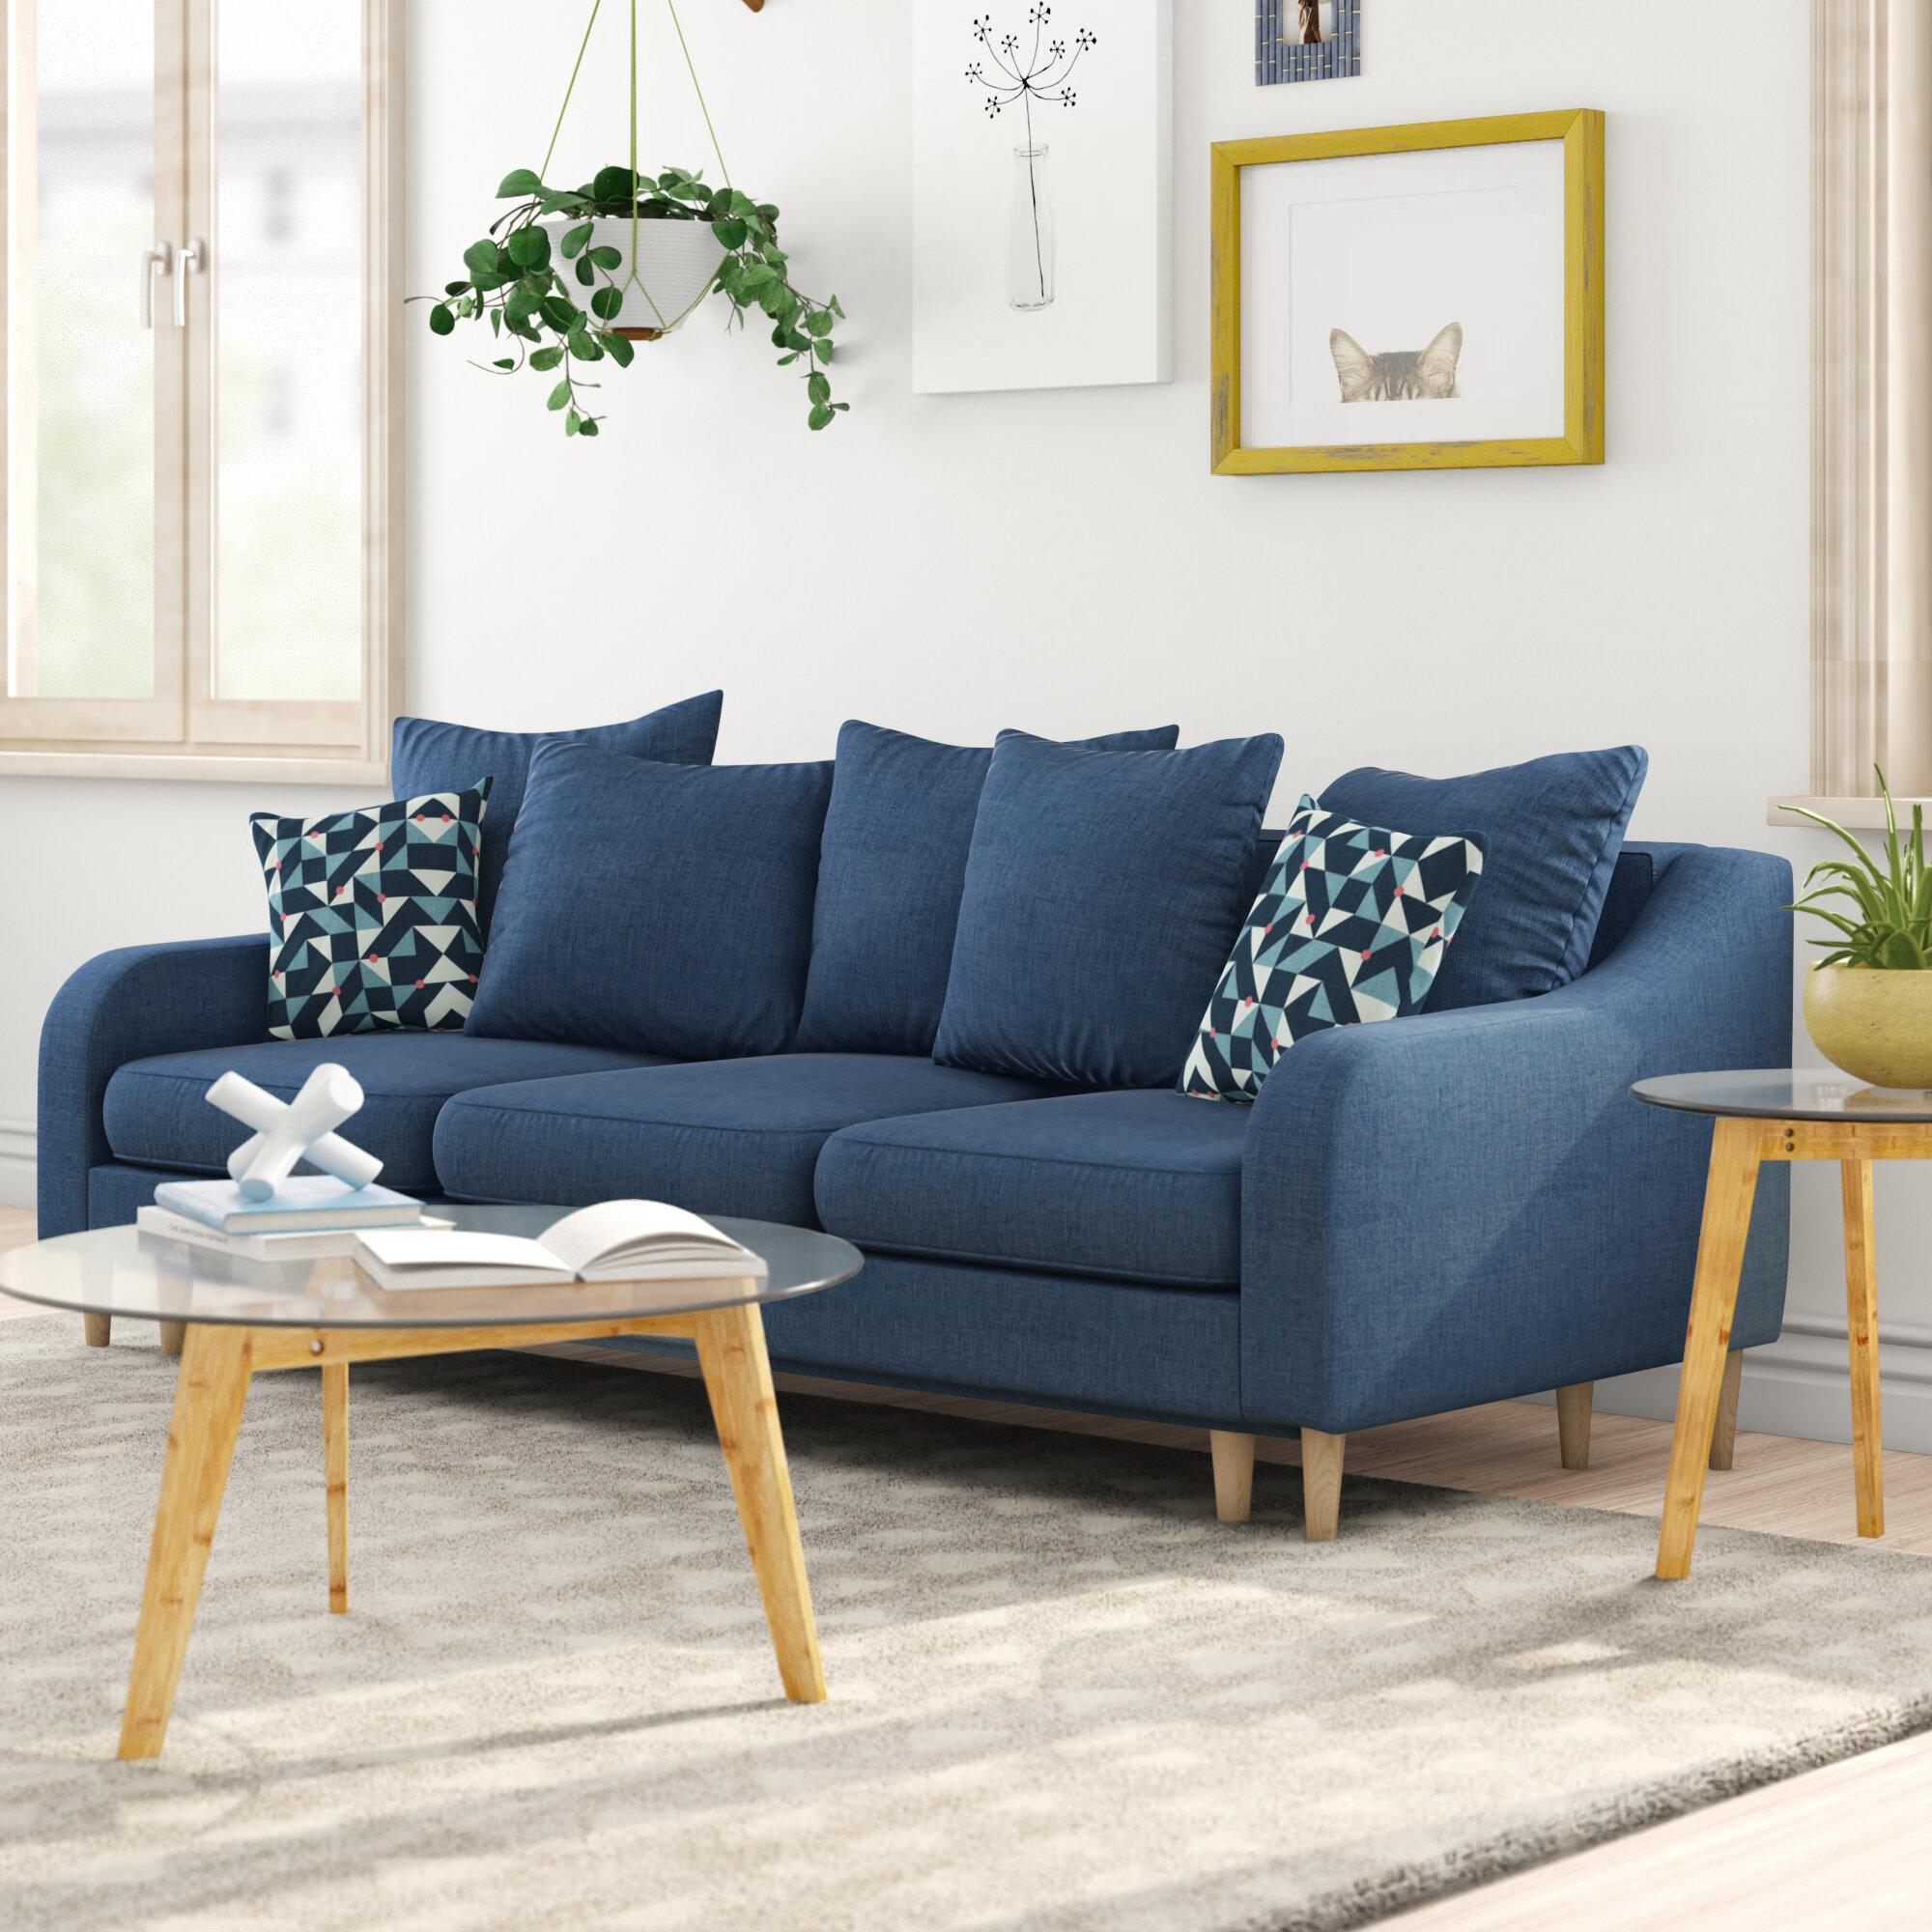 Tenley 3 Seater Clic Clac Sofa Bed